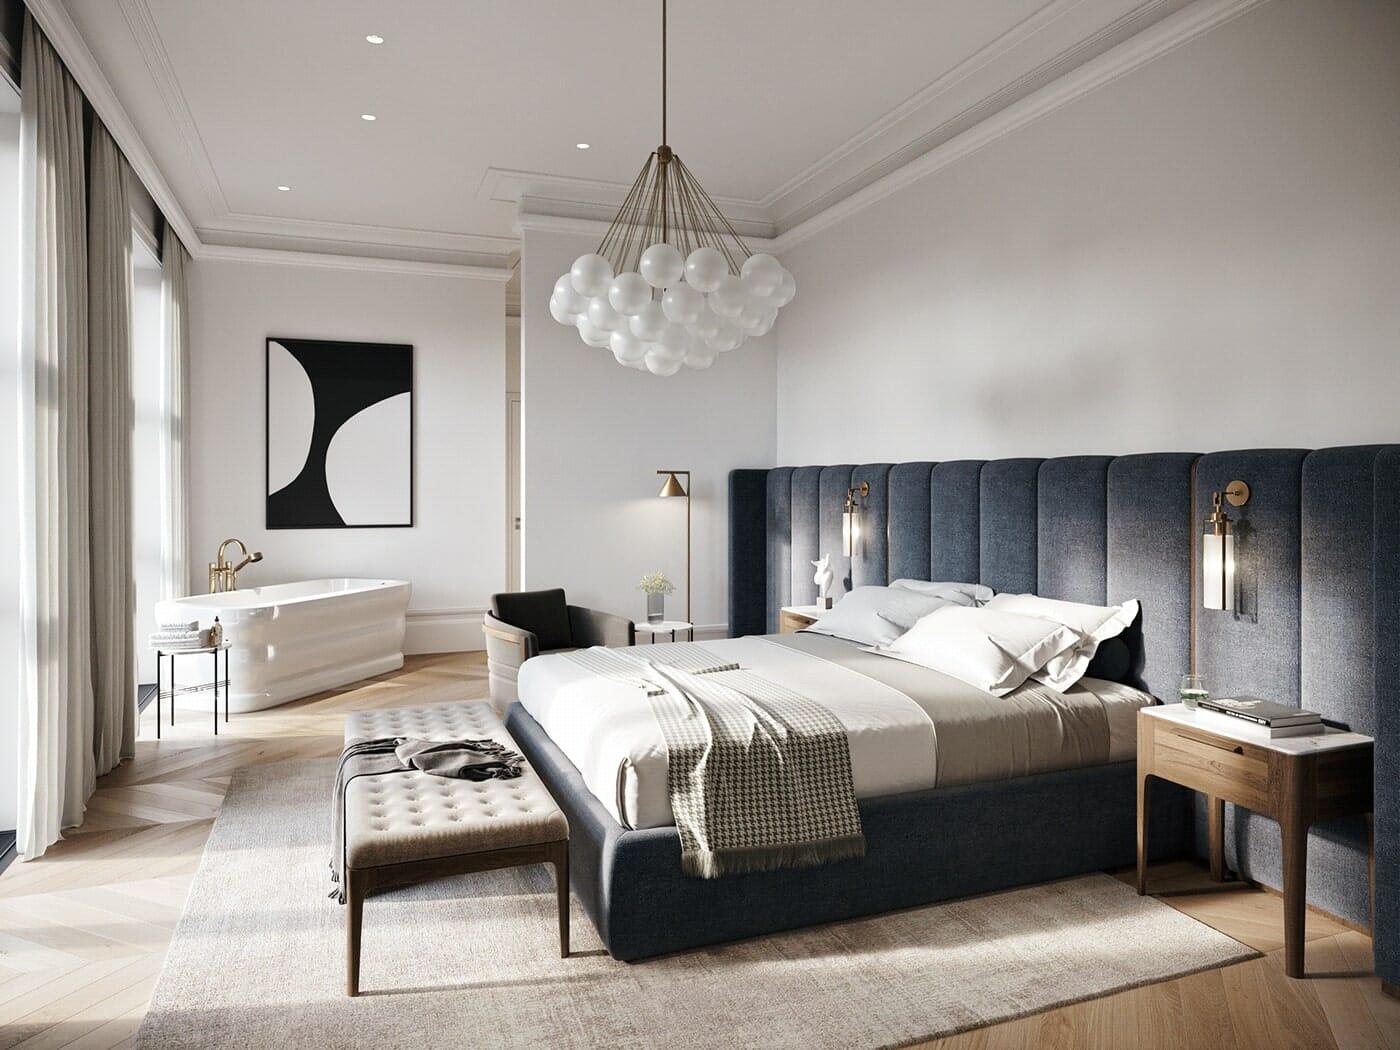 Minimal & Modern master bedroom design for a sleek look